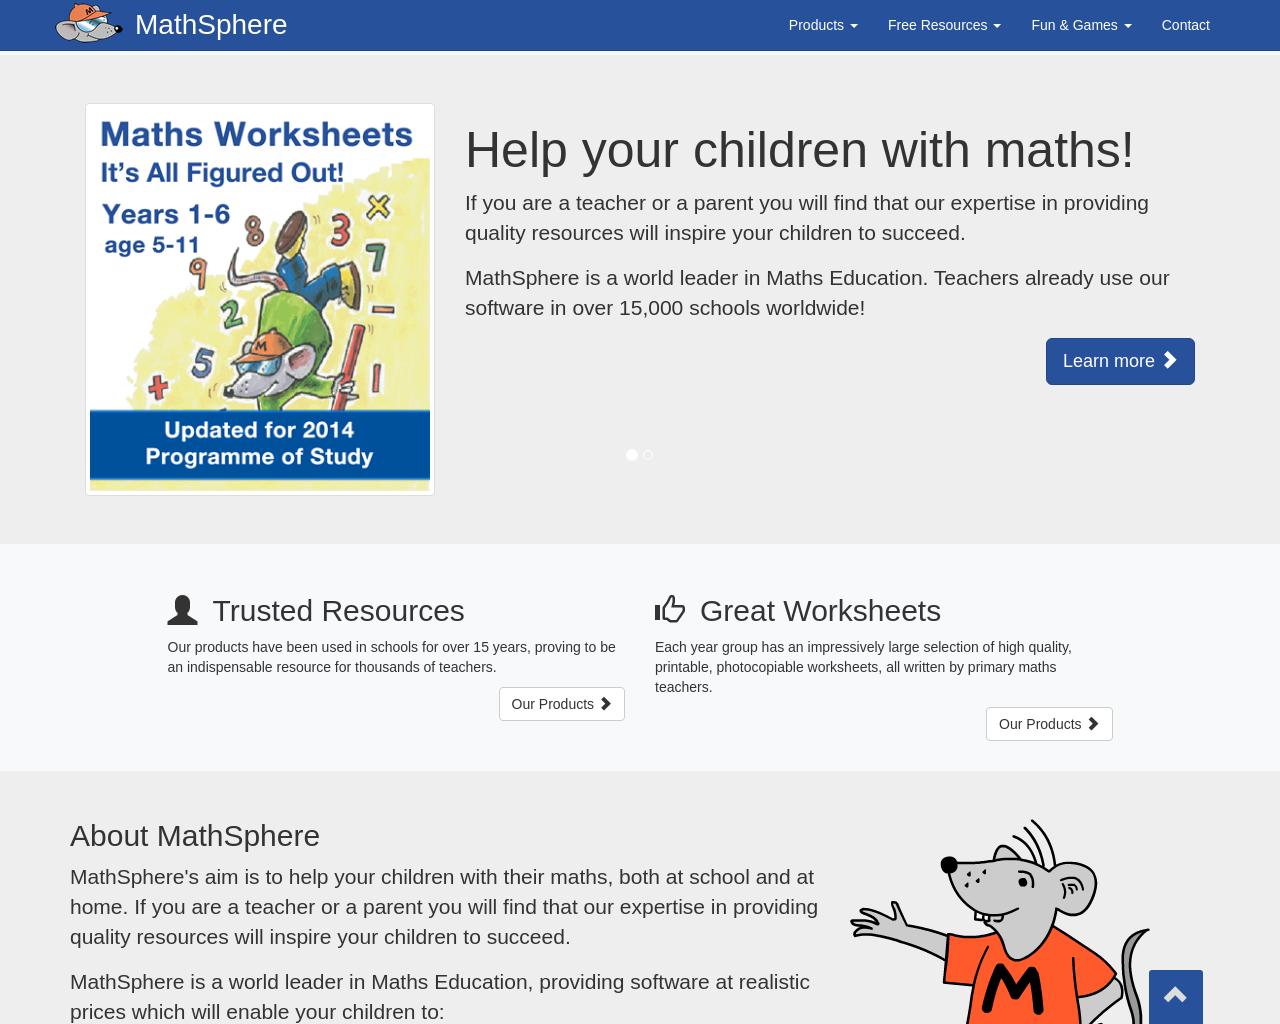 Maths Sphere